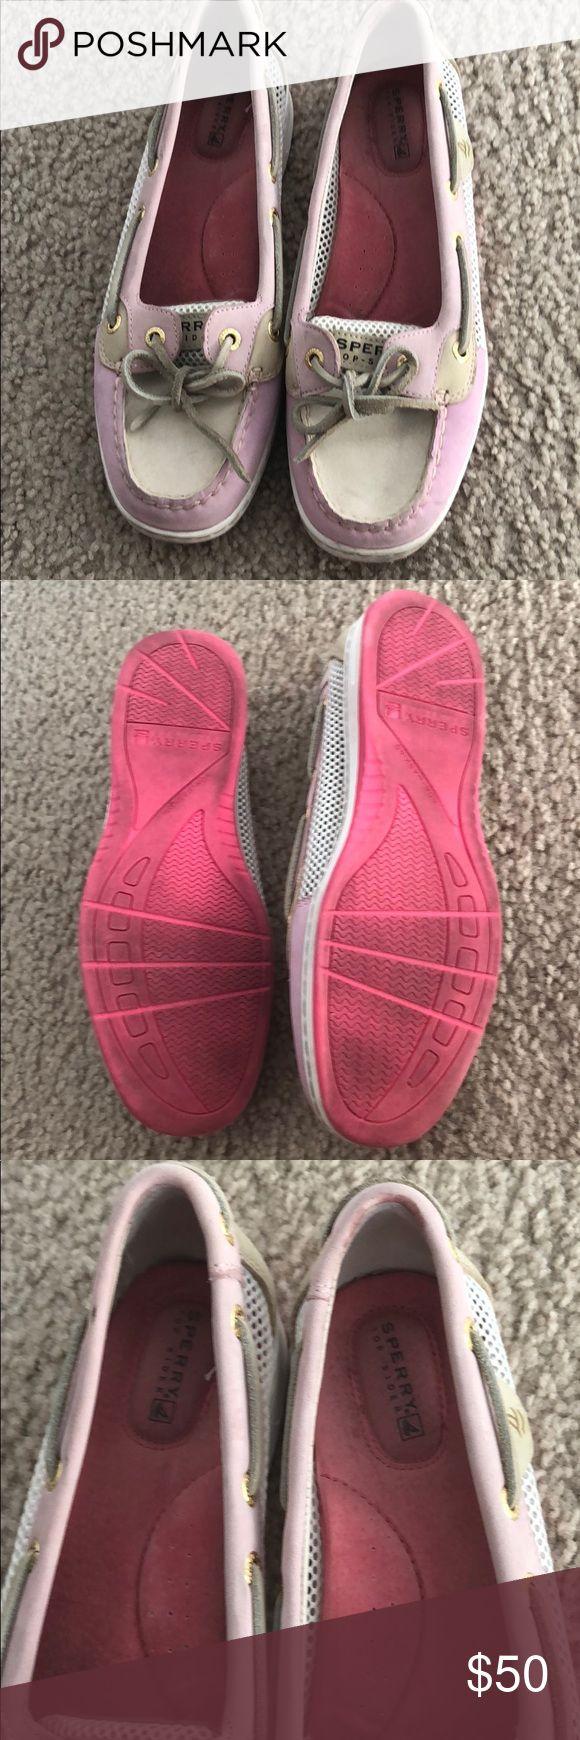 Best 25+ Sperry boat shoes ideas on Pinterest